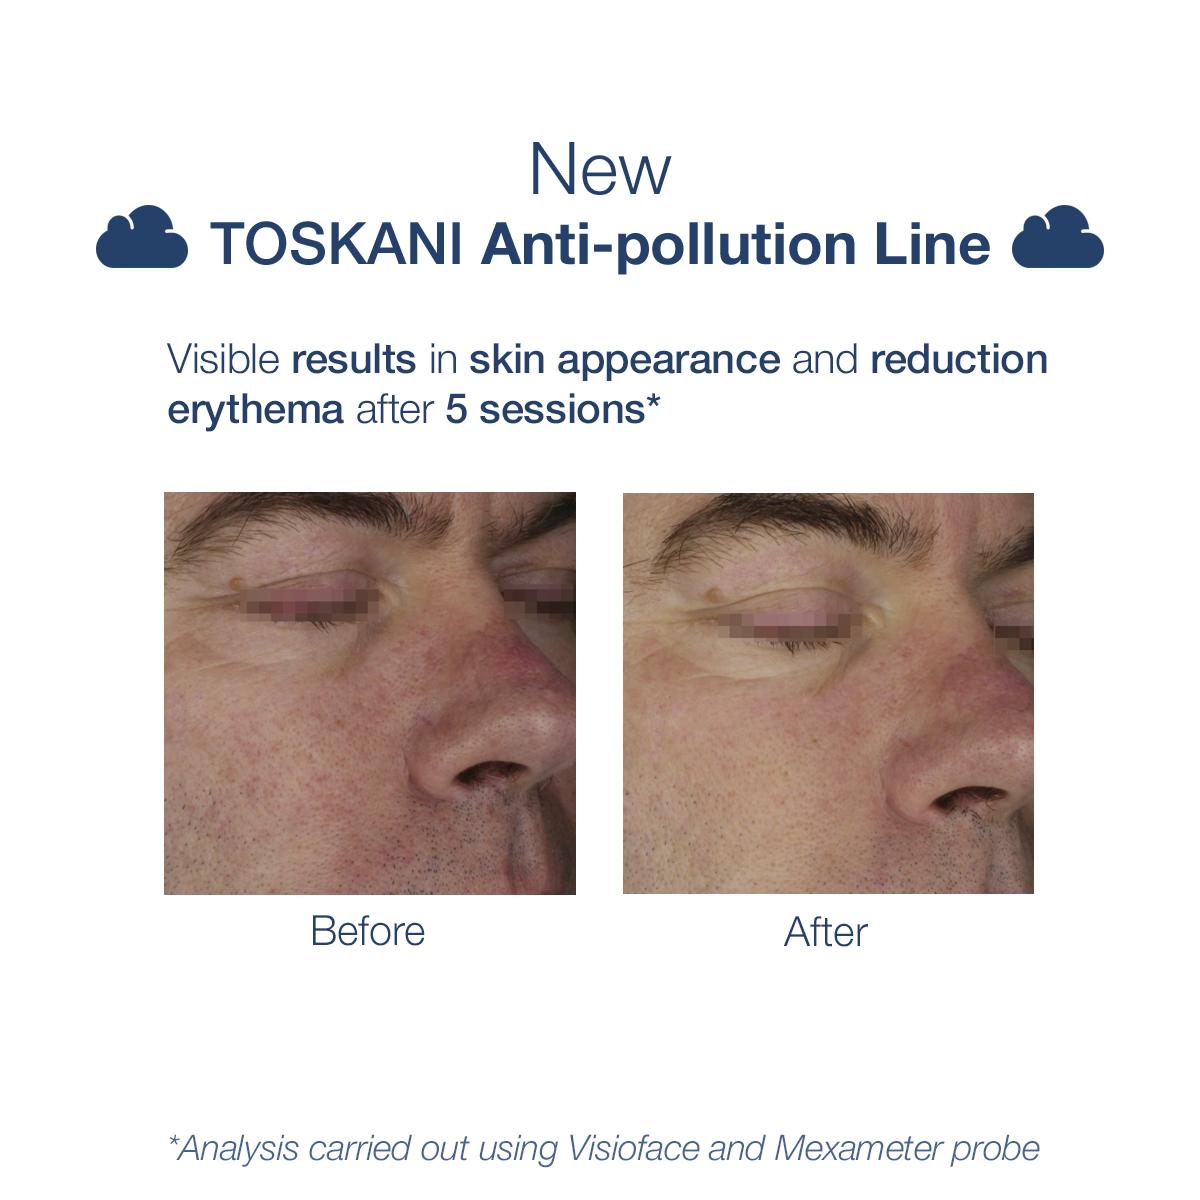 TKN_antipollutionline_b-a_3